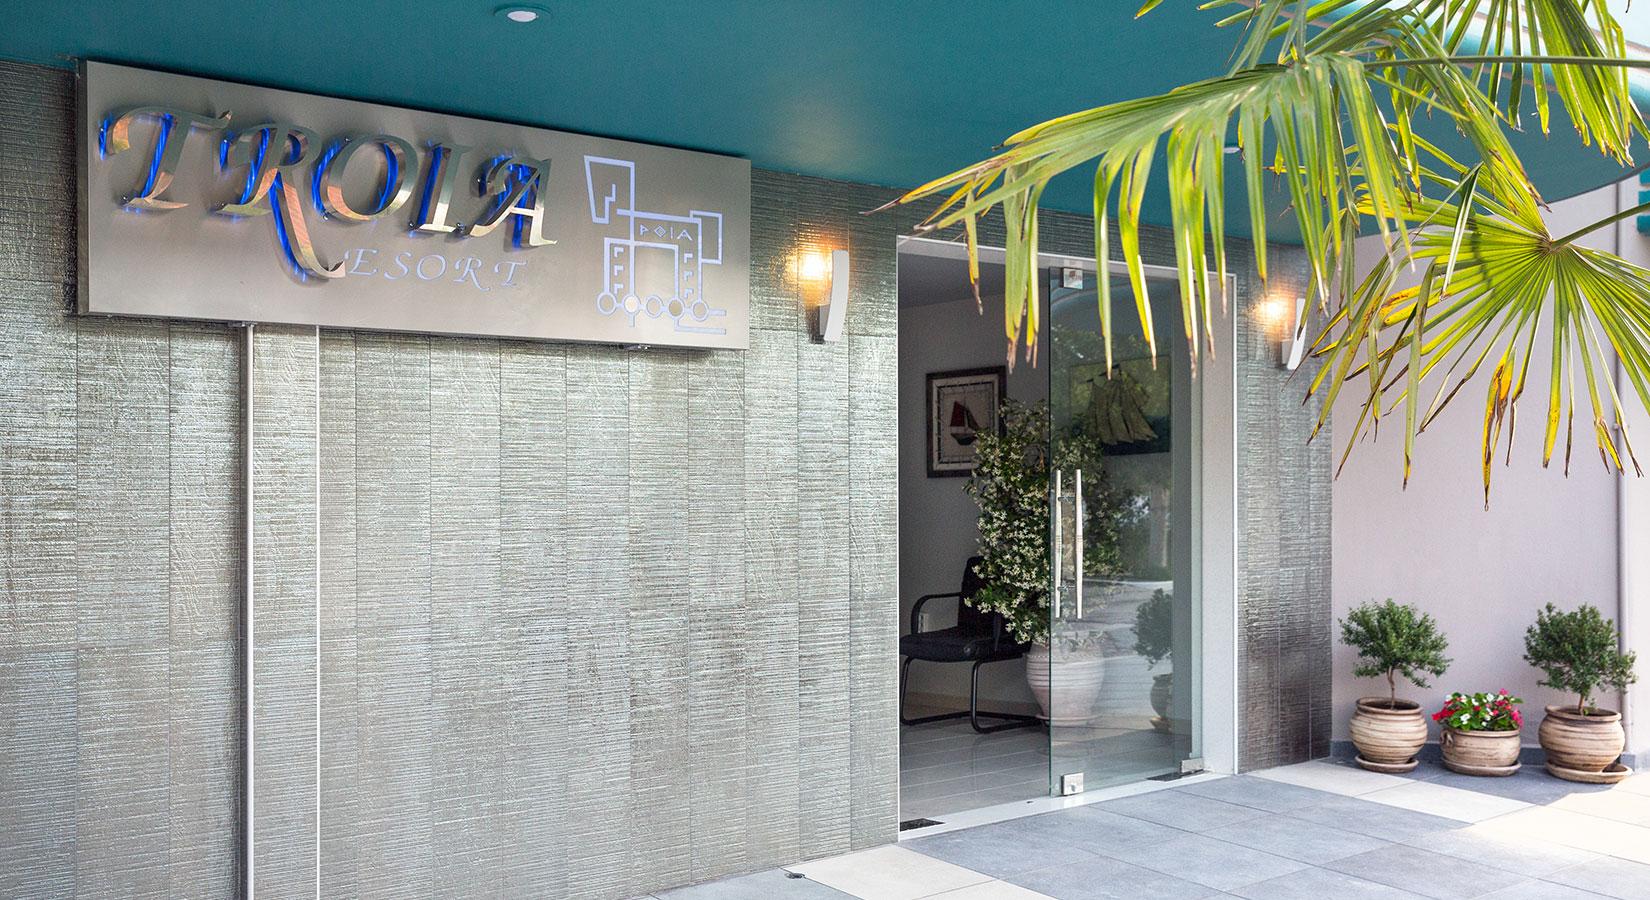 Troia Resort | Modern studios to rent in Asprovalta | Rent Rooms, Rent Studios, Rent Apartments, Asprovalta, Nea Vrasna